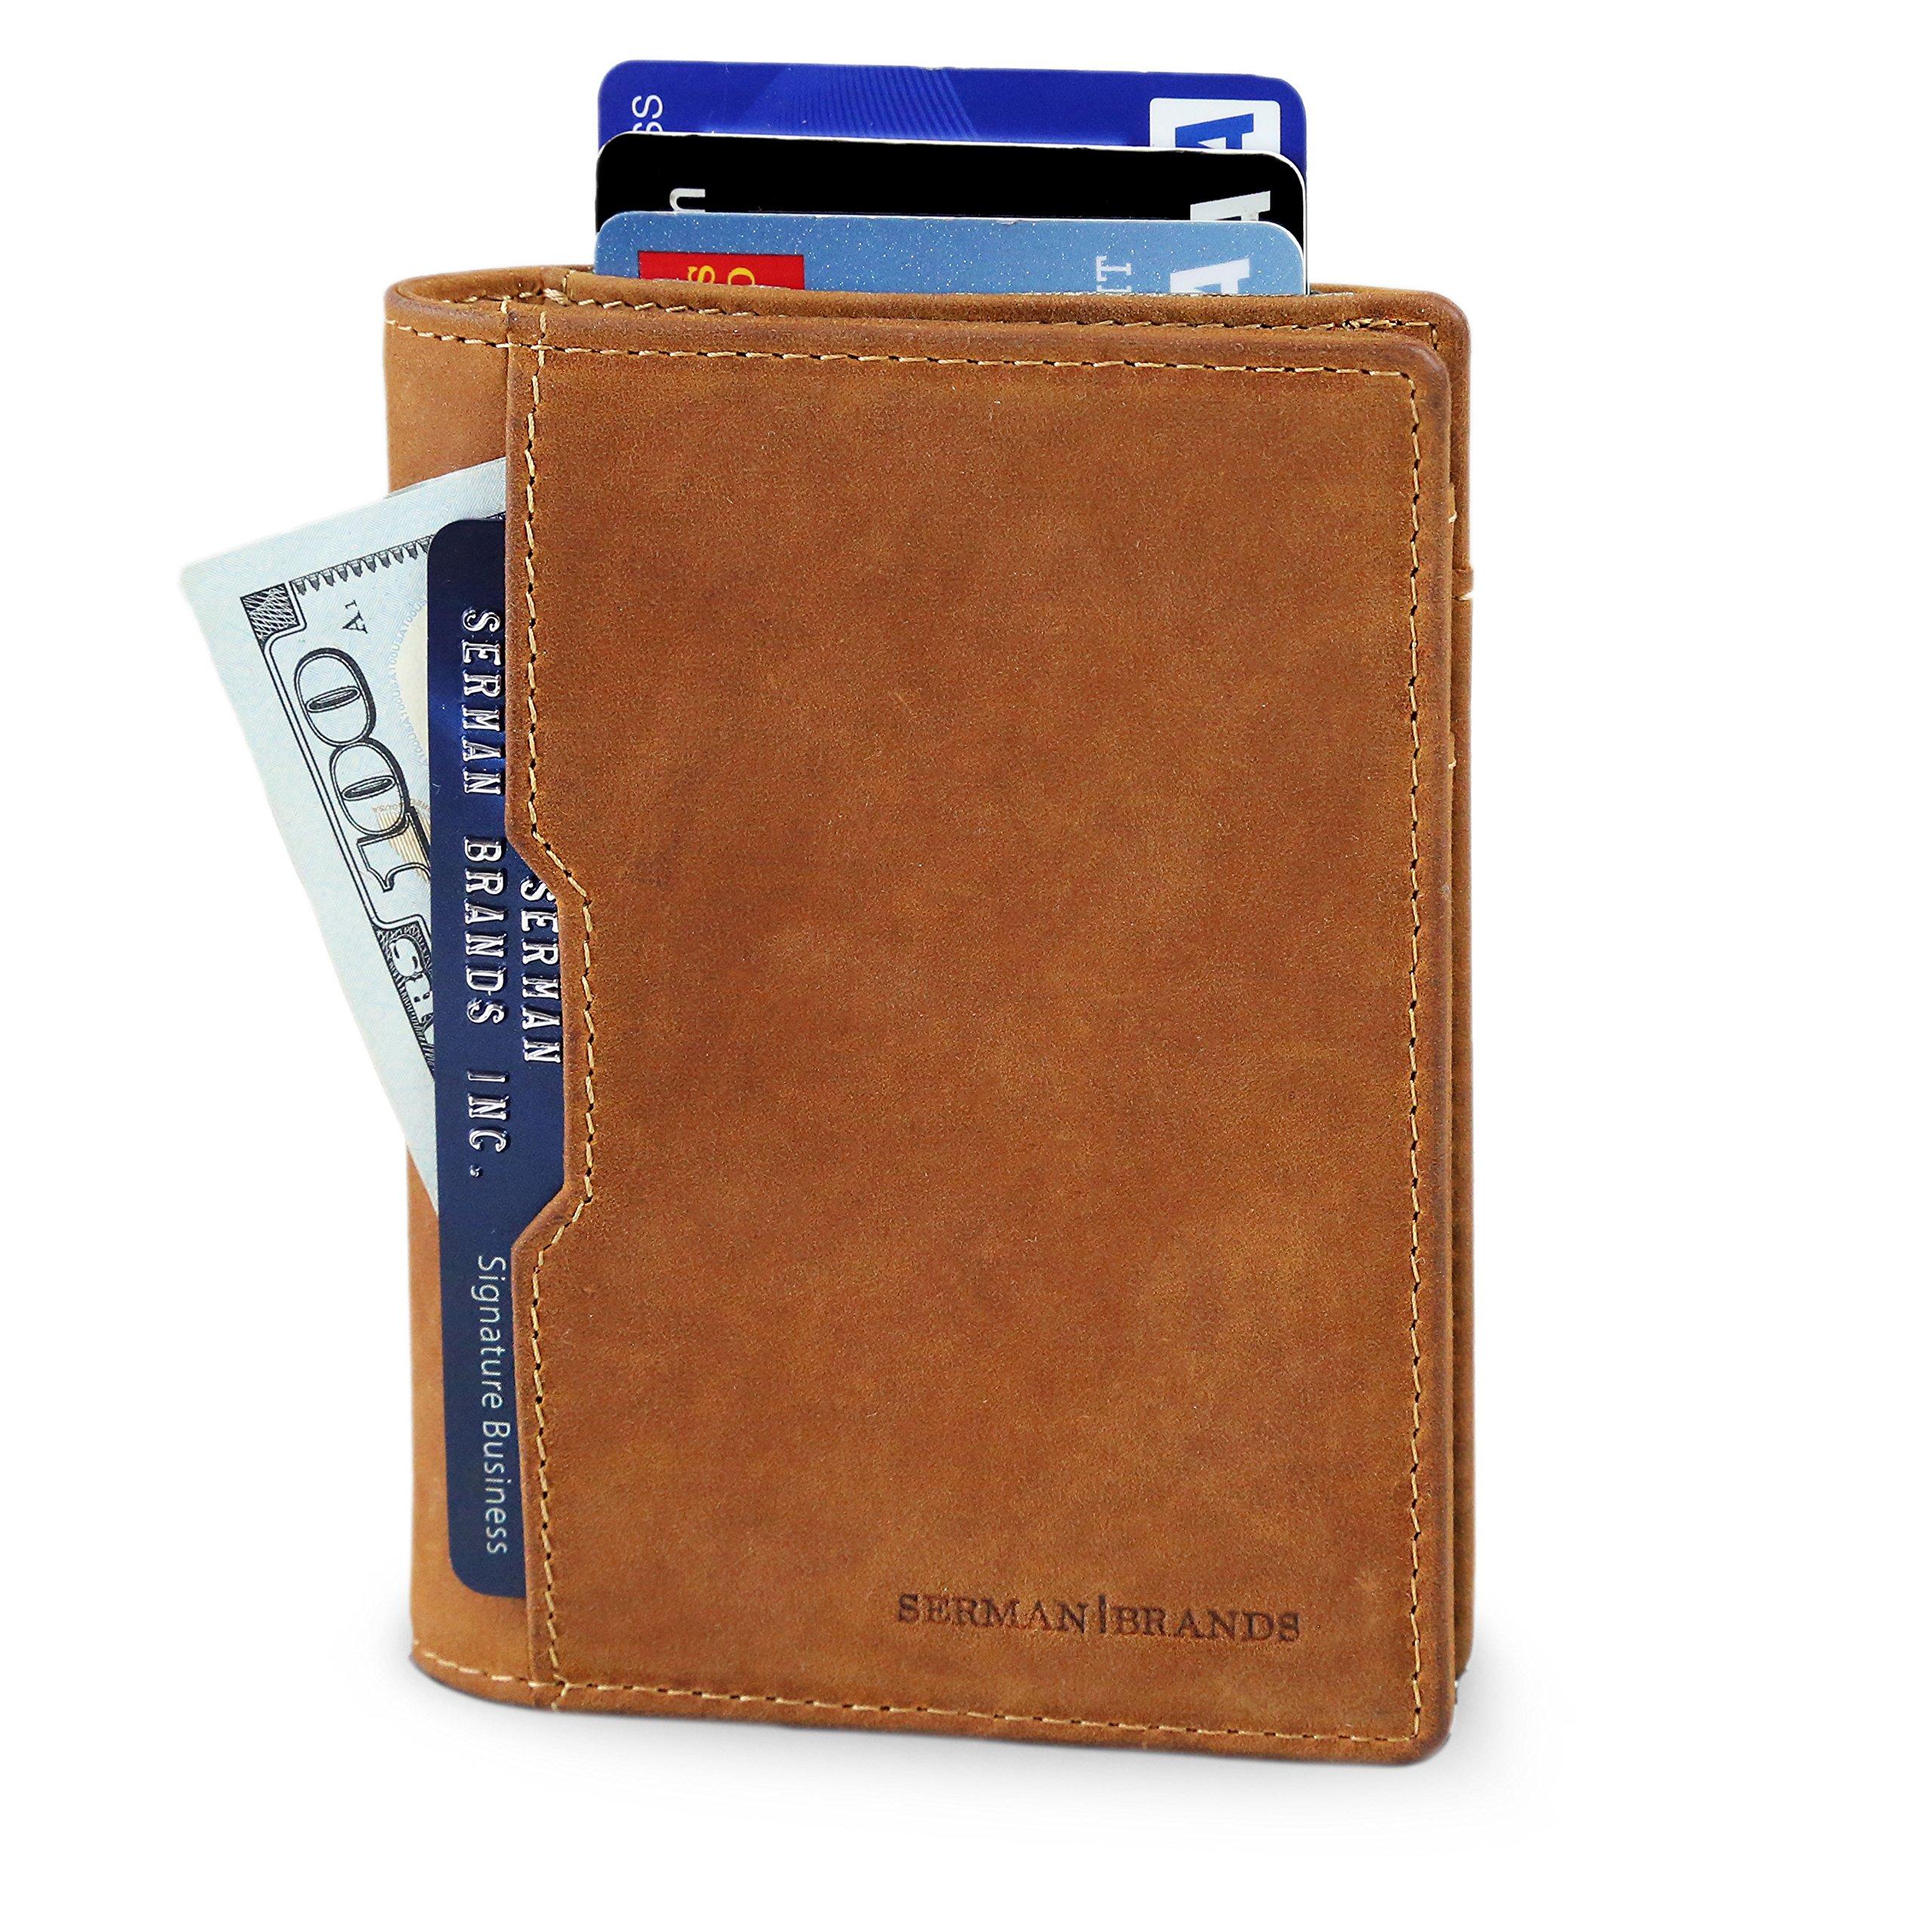 Wallets for Men Slim Mens leather RFID Blocking Minimalist Card Front Pocket Bifold Travel Thin (California Desert 5.0) by SERMAN BRANDS